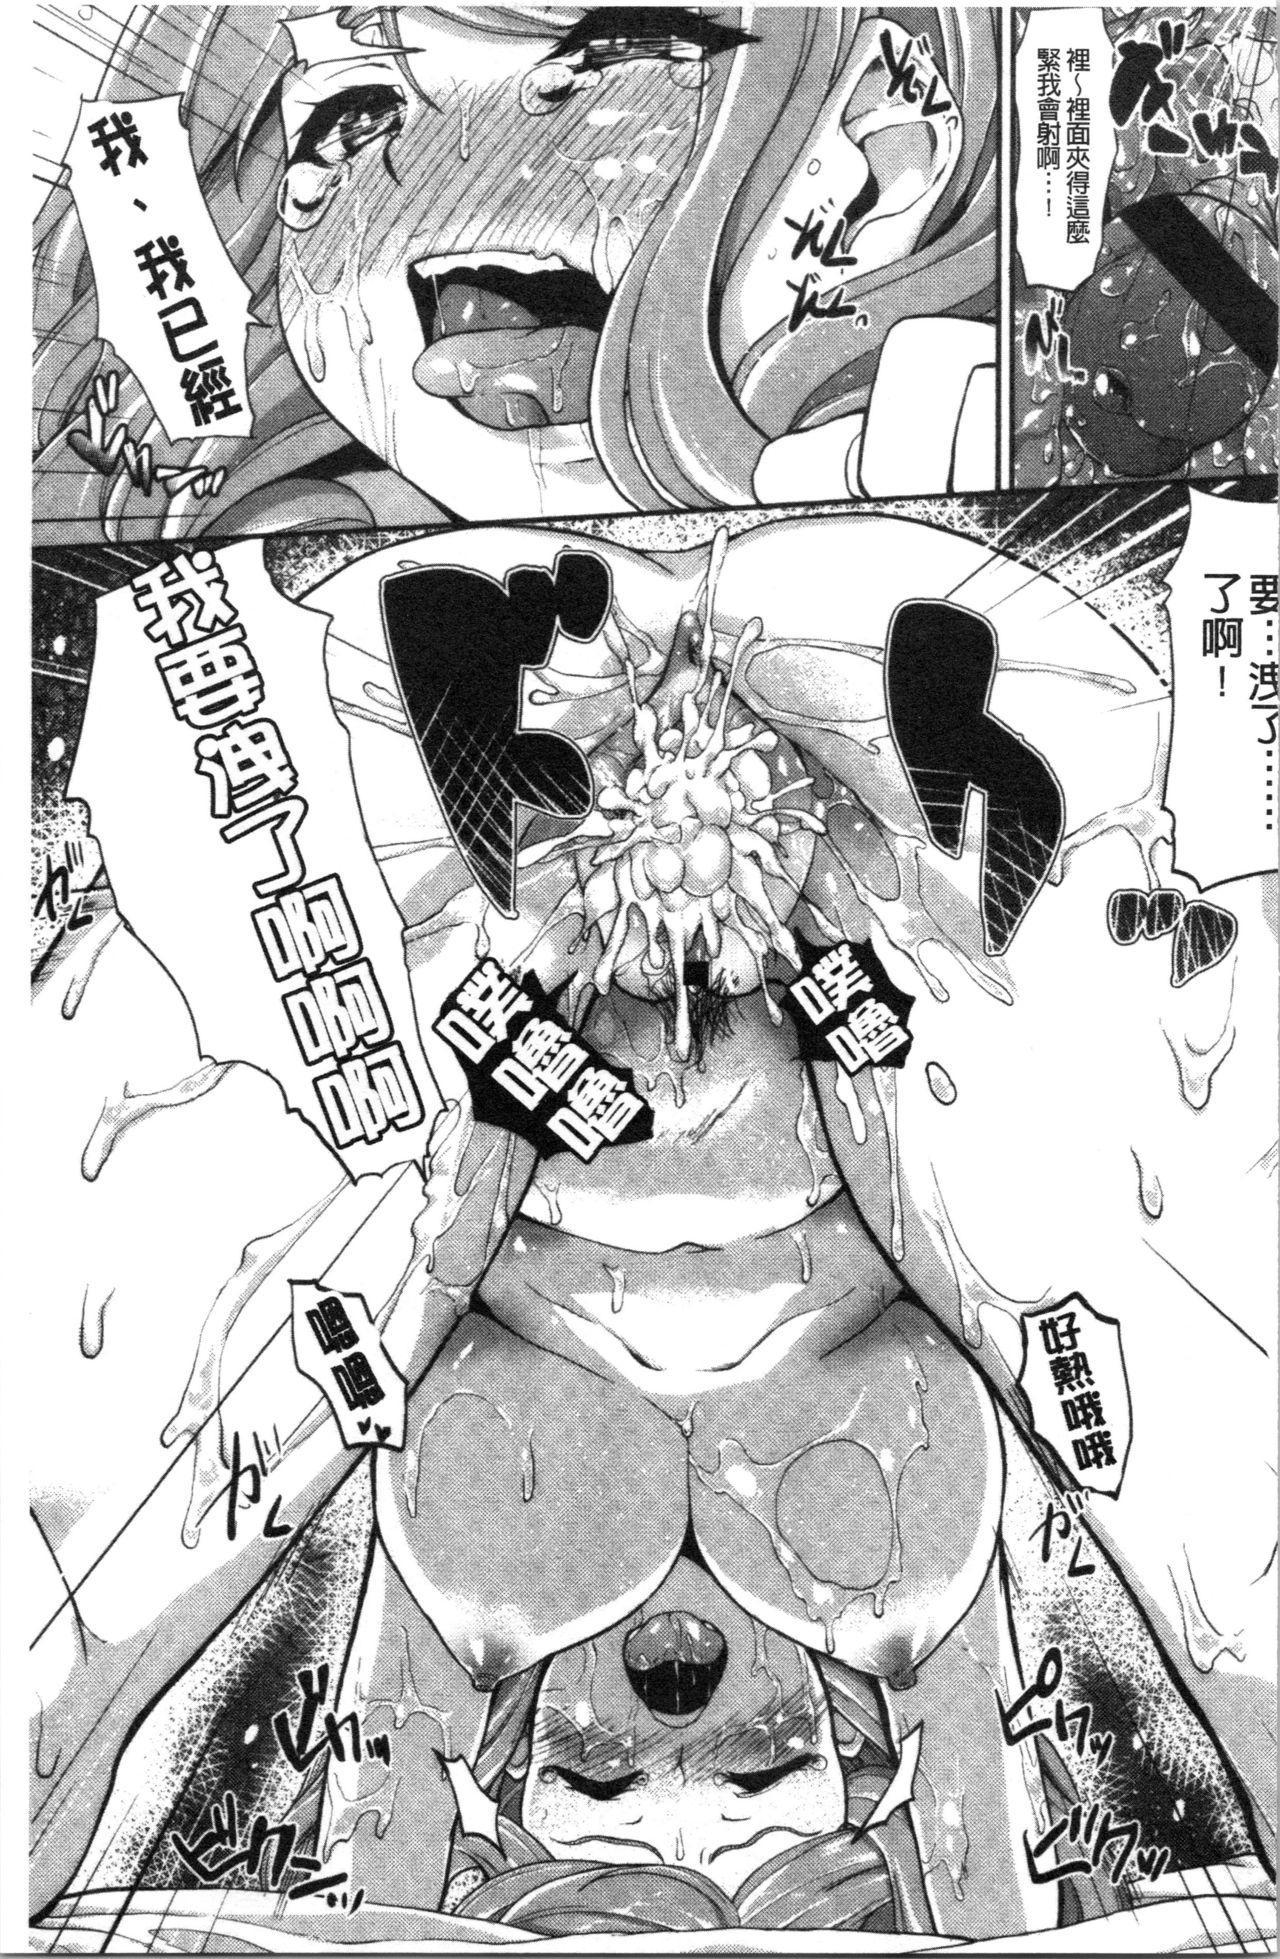 Kanojo ga SEX ni nare teru wake | 女友對激情性愛變很習慣的理由 175